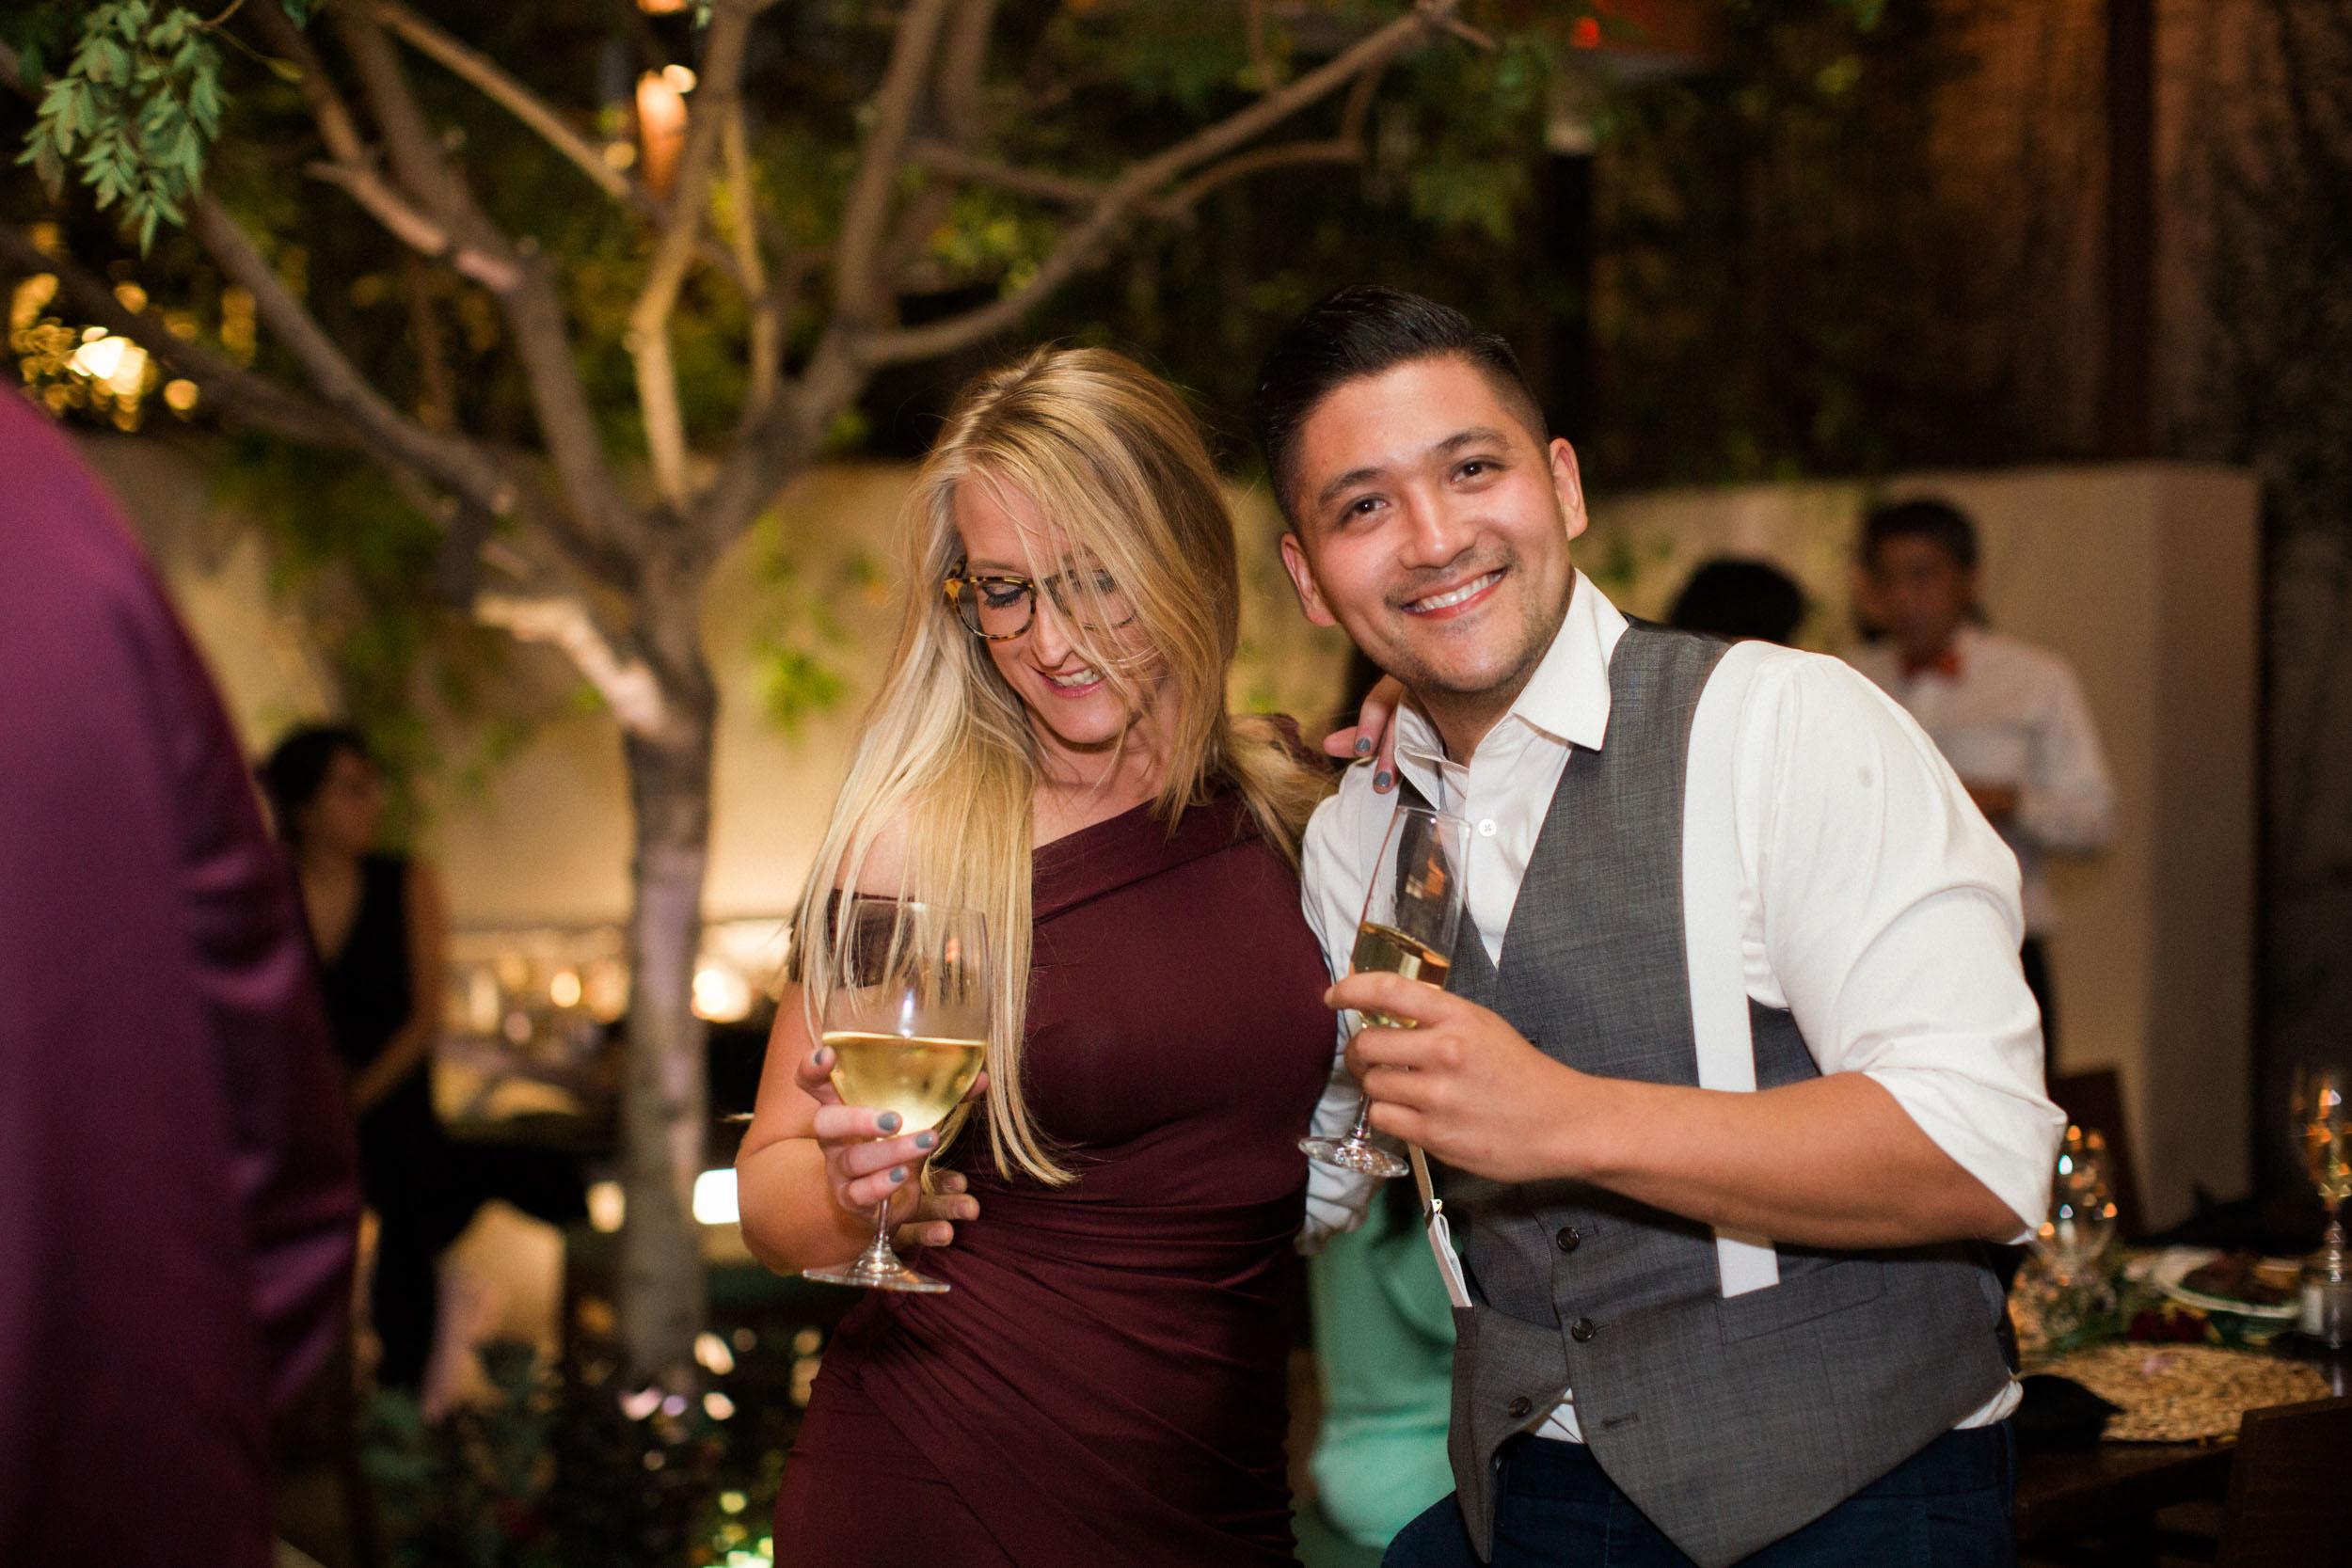 BKM-Photography-Highland-Park-Los-Angeles-Backyard-Wedding-0080.jpg